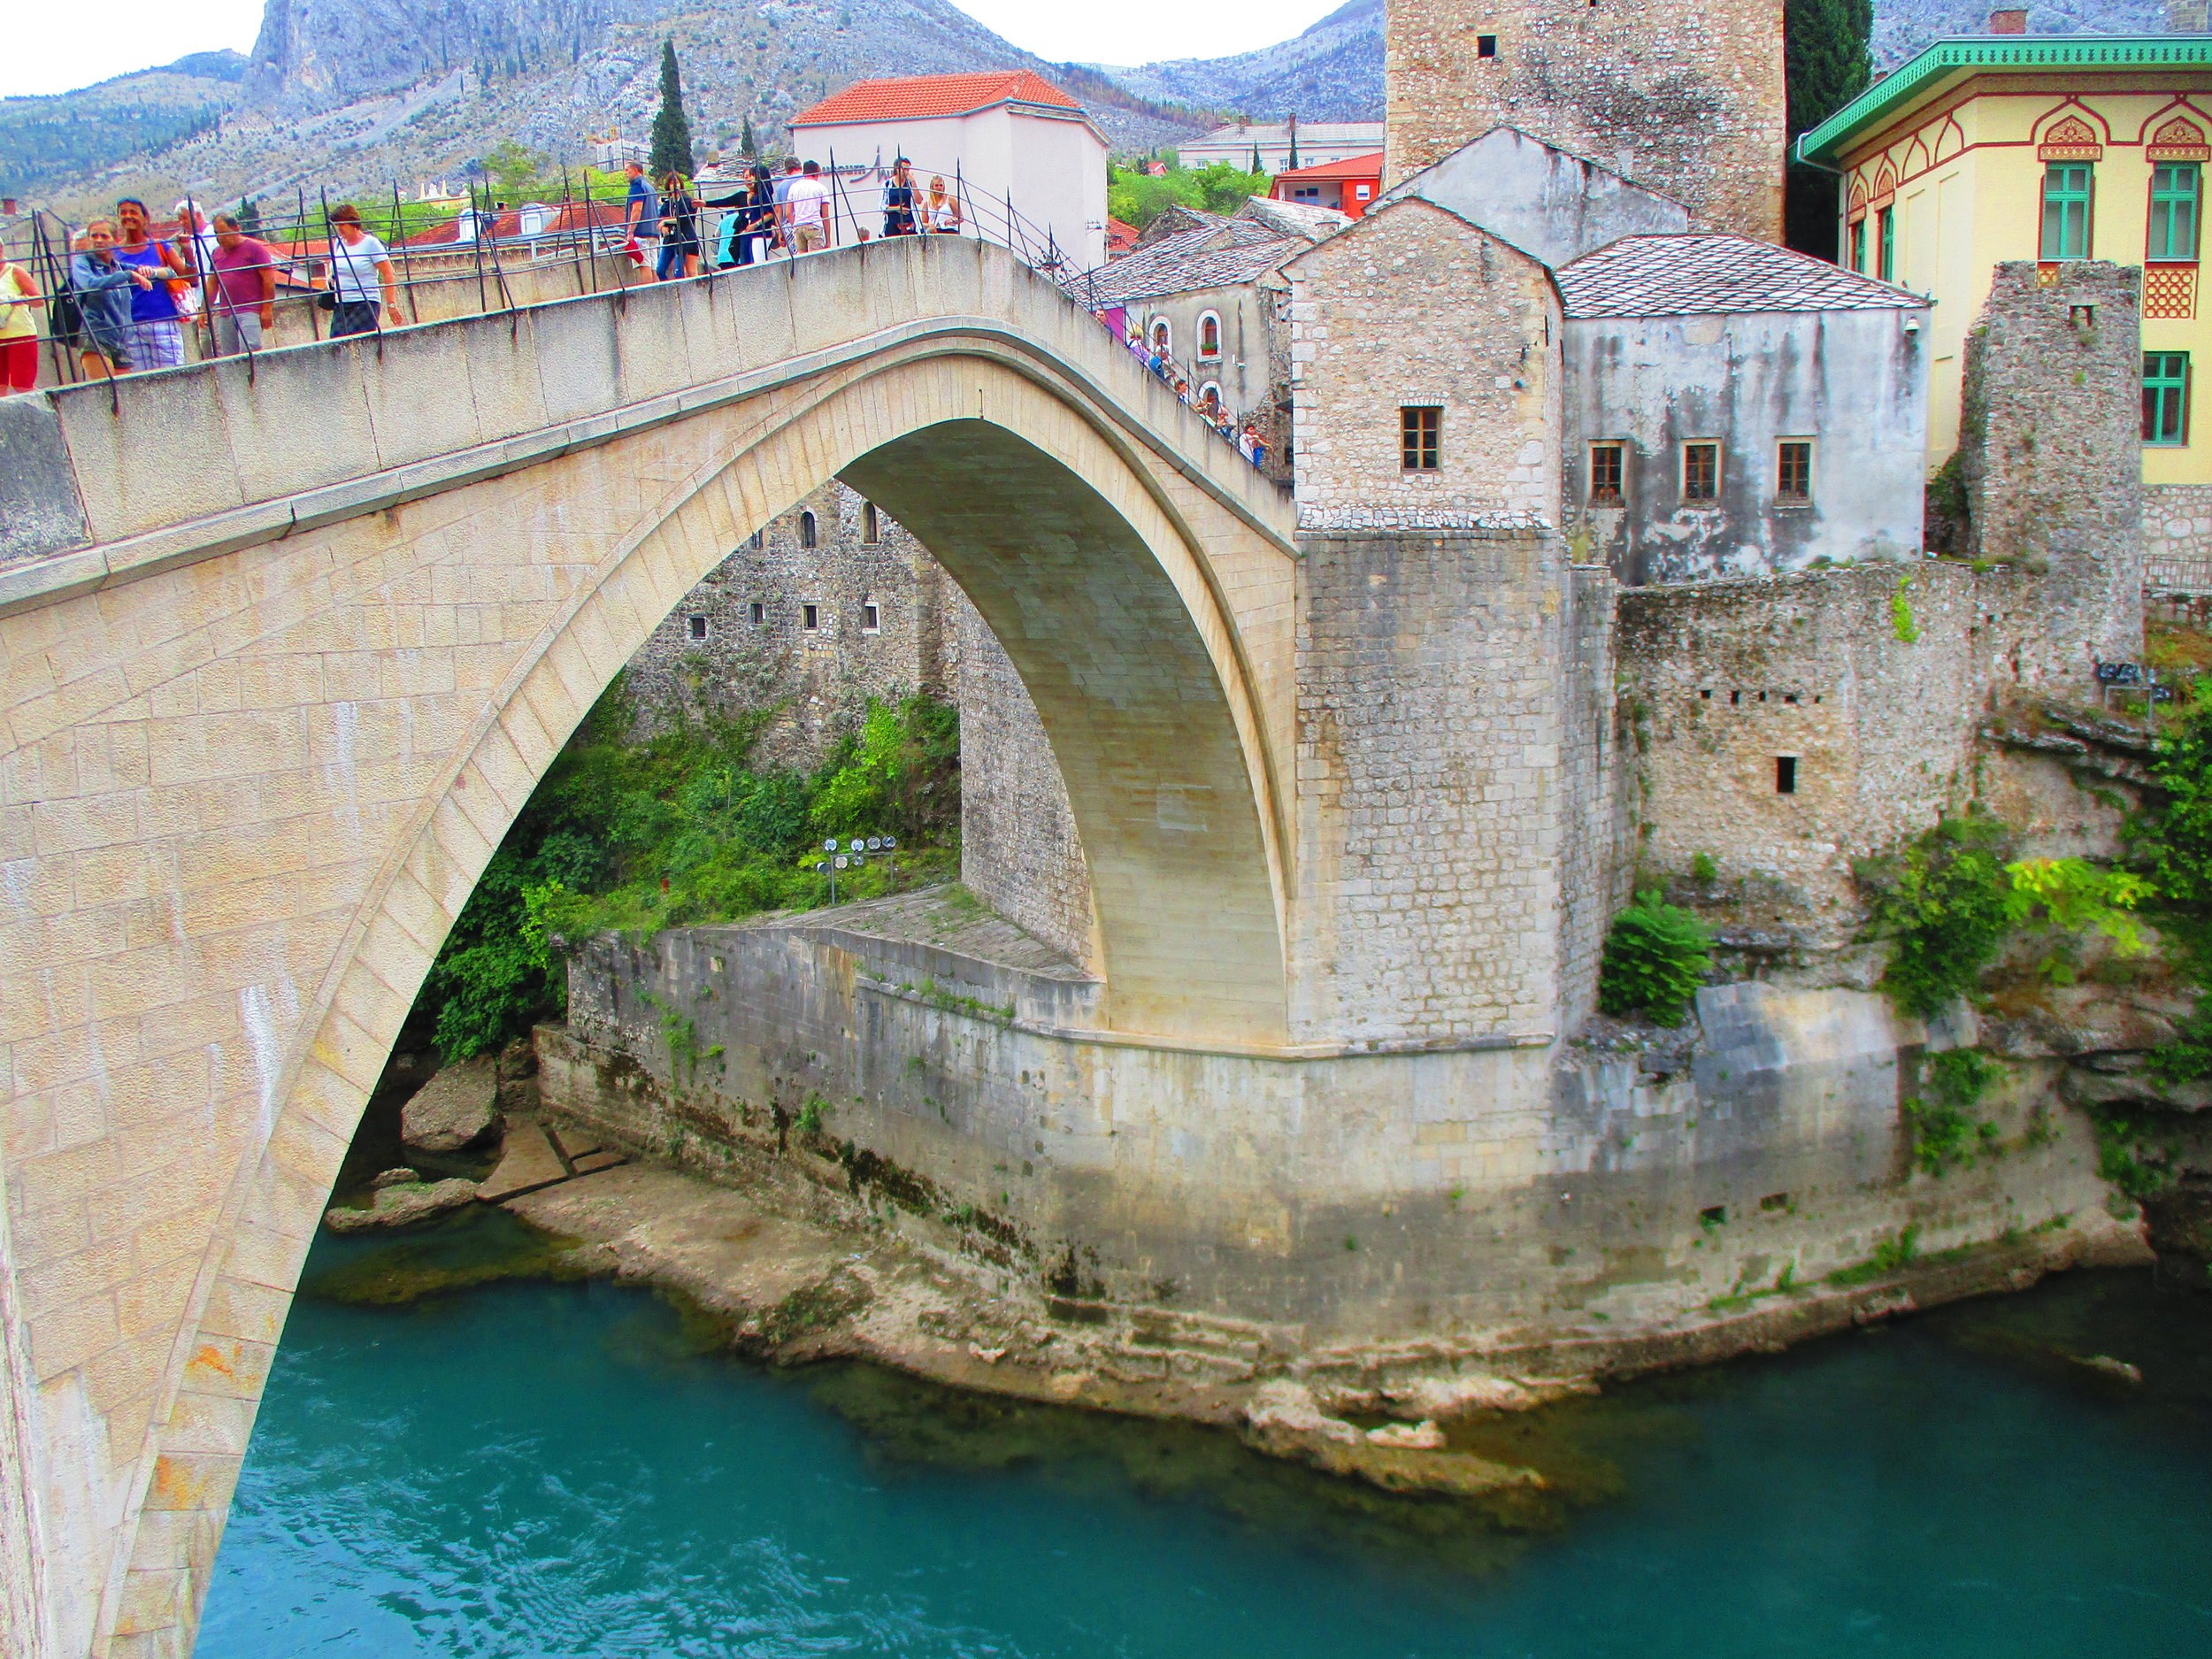 The 'Old Bridge', Mostar